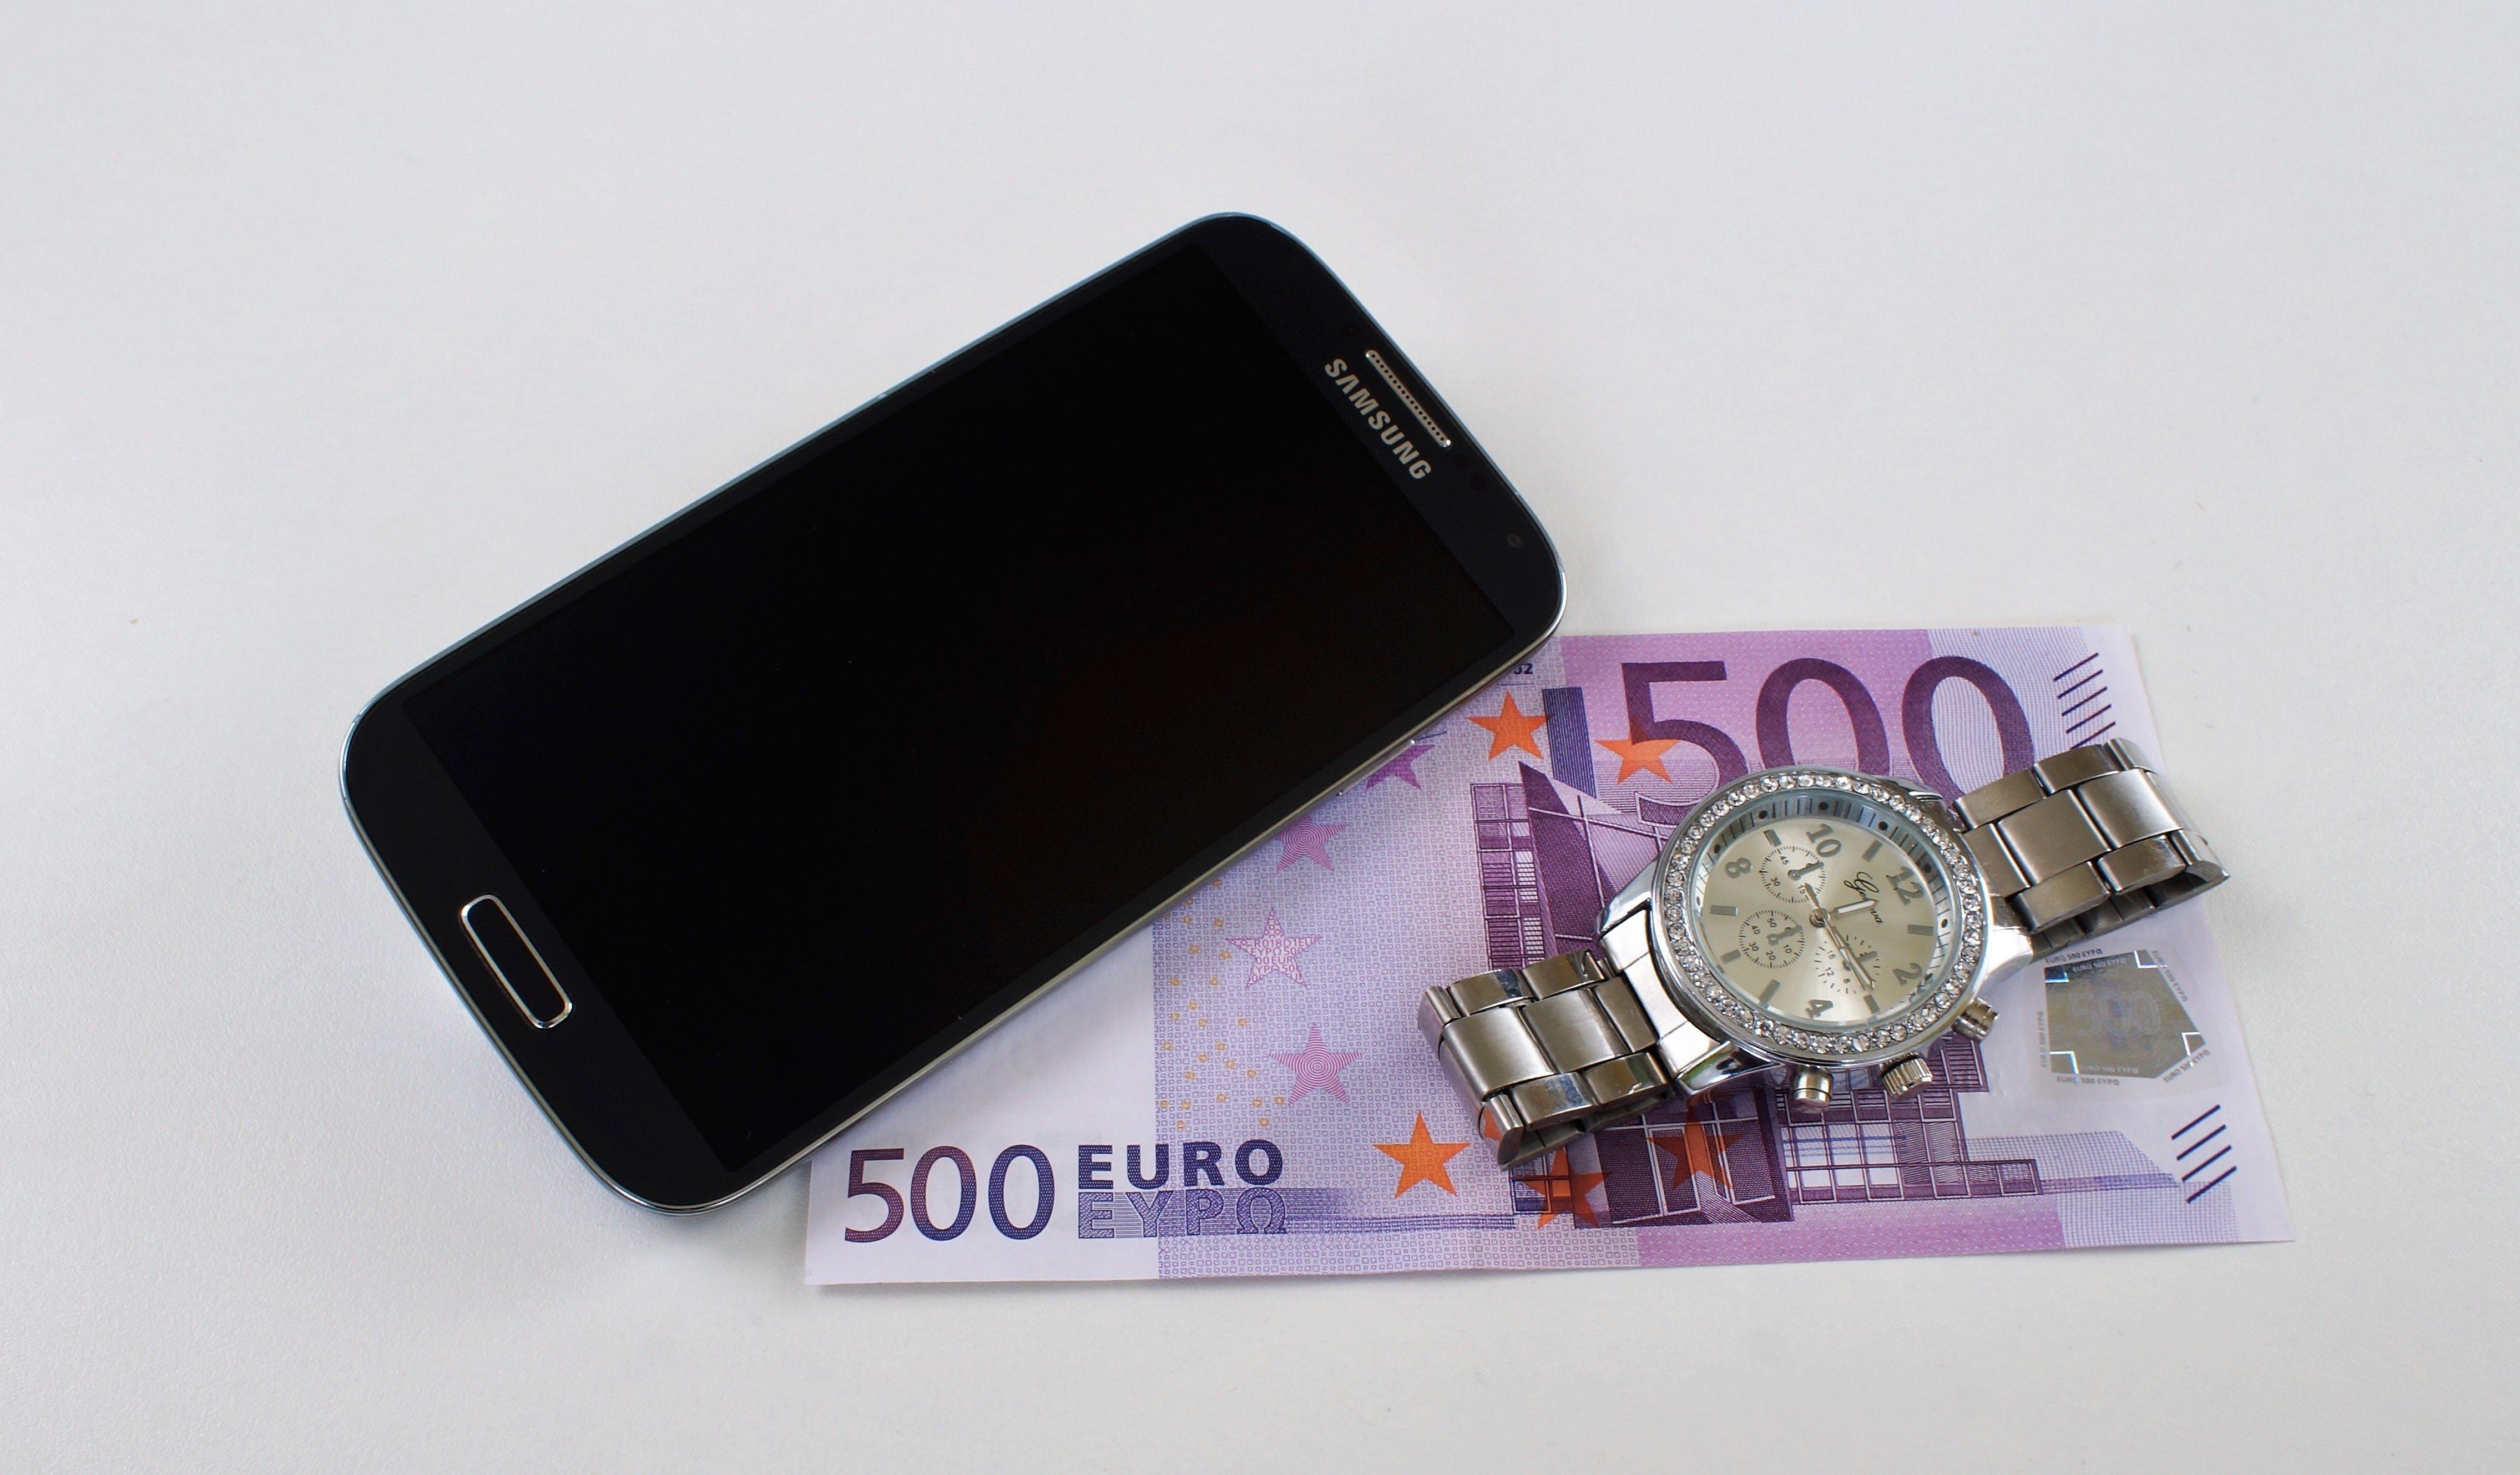 Black Samsung Galaxy Smartphone Beside Silver-colored Watch